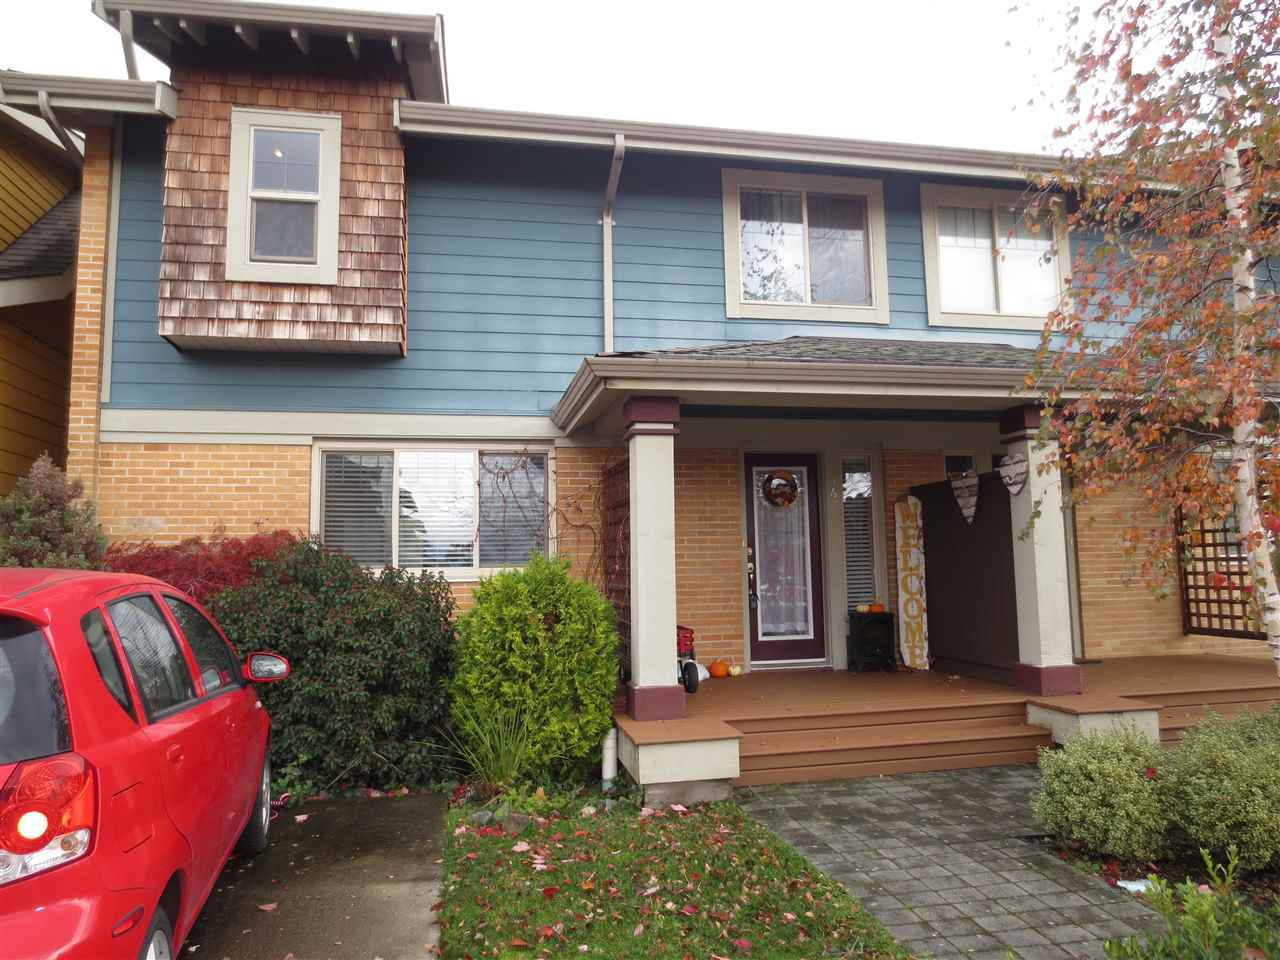 Main Photo: 44 5960 COWICHAN STREET in : Vedder S Watson-Promontory Townhouse for sale : MLS®# R2320660